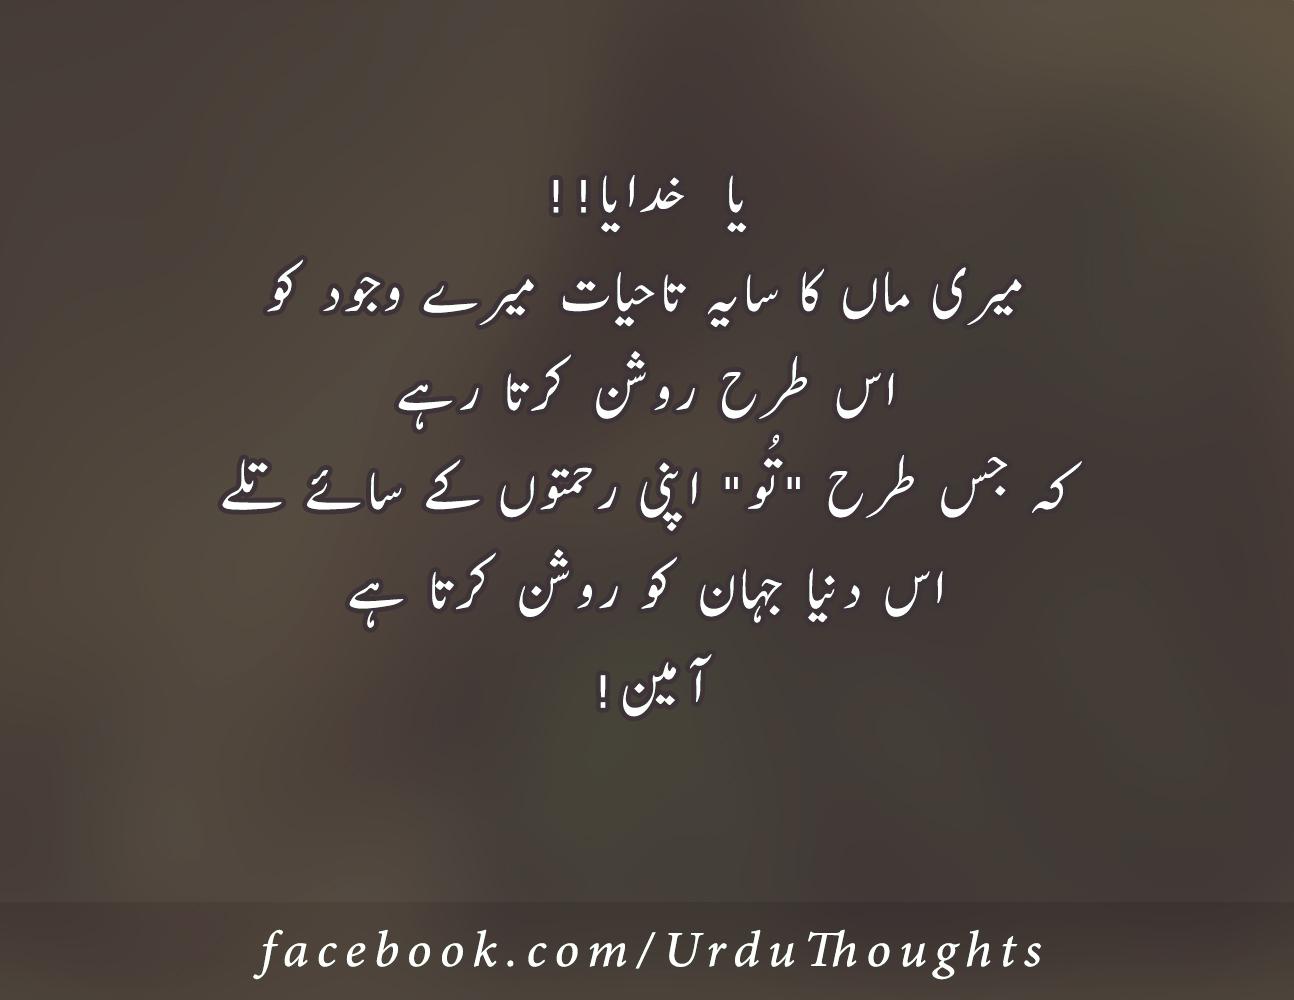 Beautiful Urdu Poetry On Mother- Phoolon Ki Khushboo ...